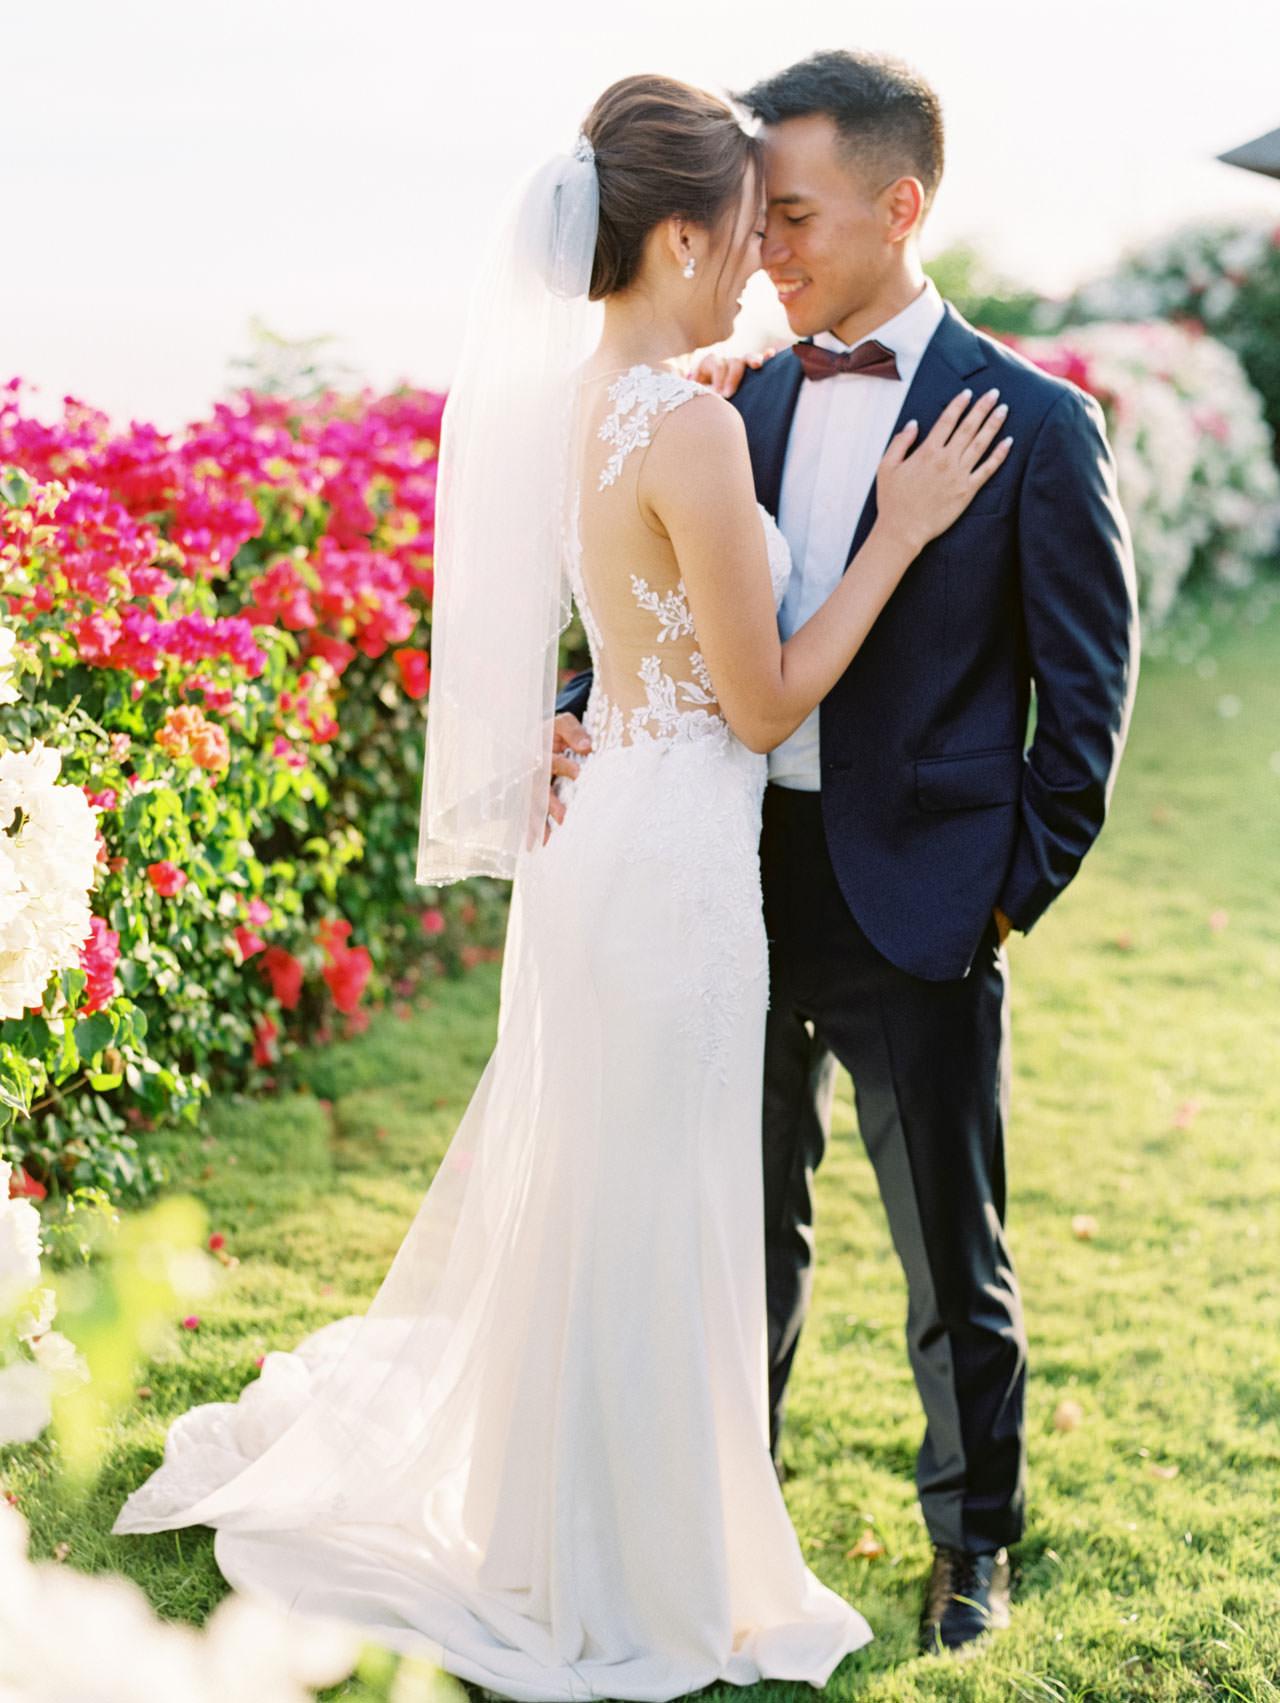 Uluwatu Cliff Wedding with Chinese Wedding Ceremony 31